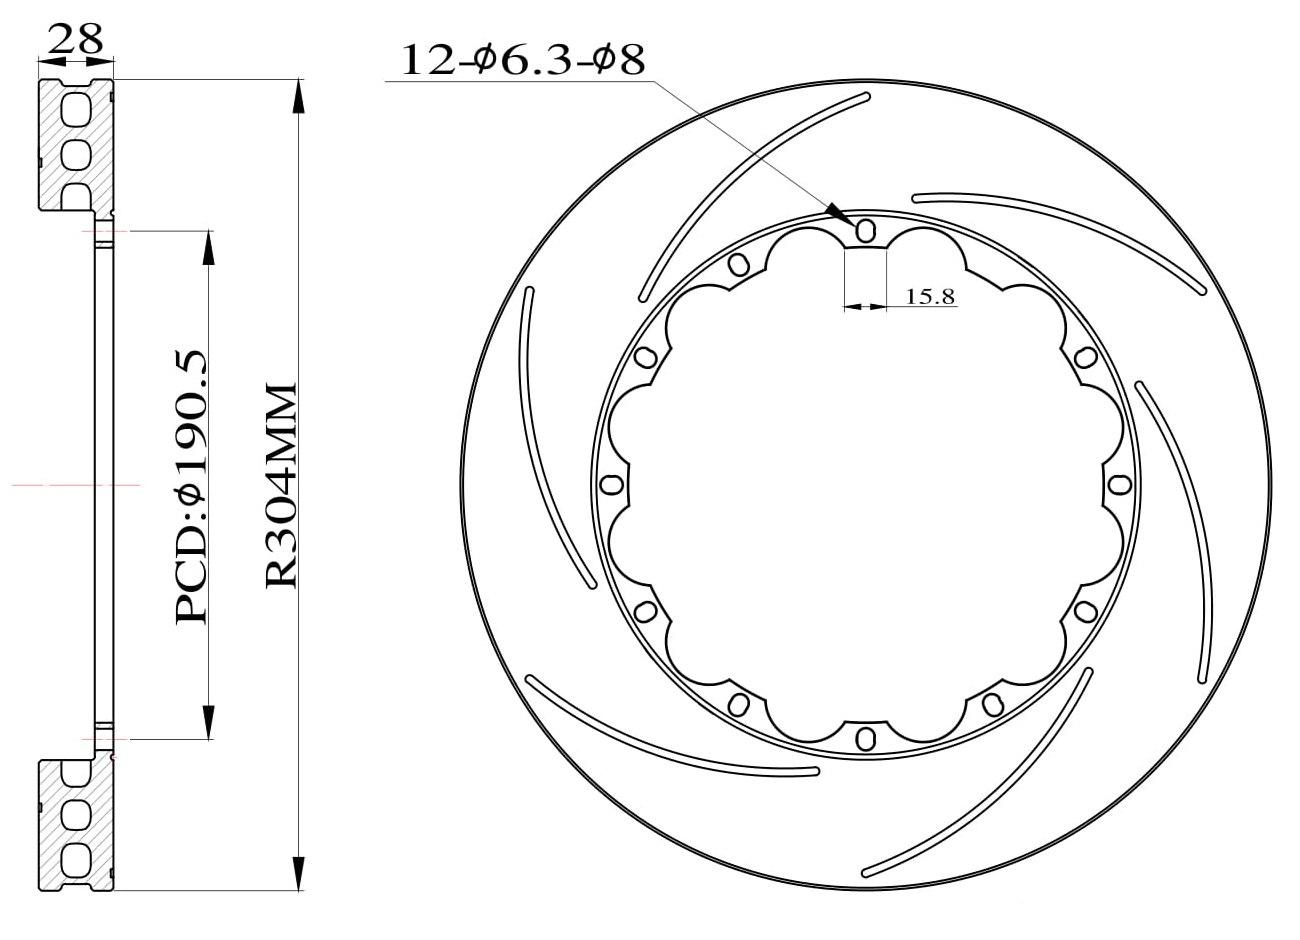 Tarcze hamulcowe nacinane do zestawu Big Brake 304mm 2009+ - GRUBYGARAGE - Sklep Tuningowy